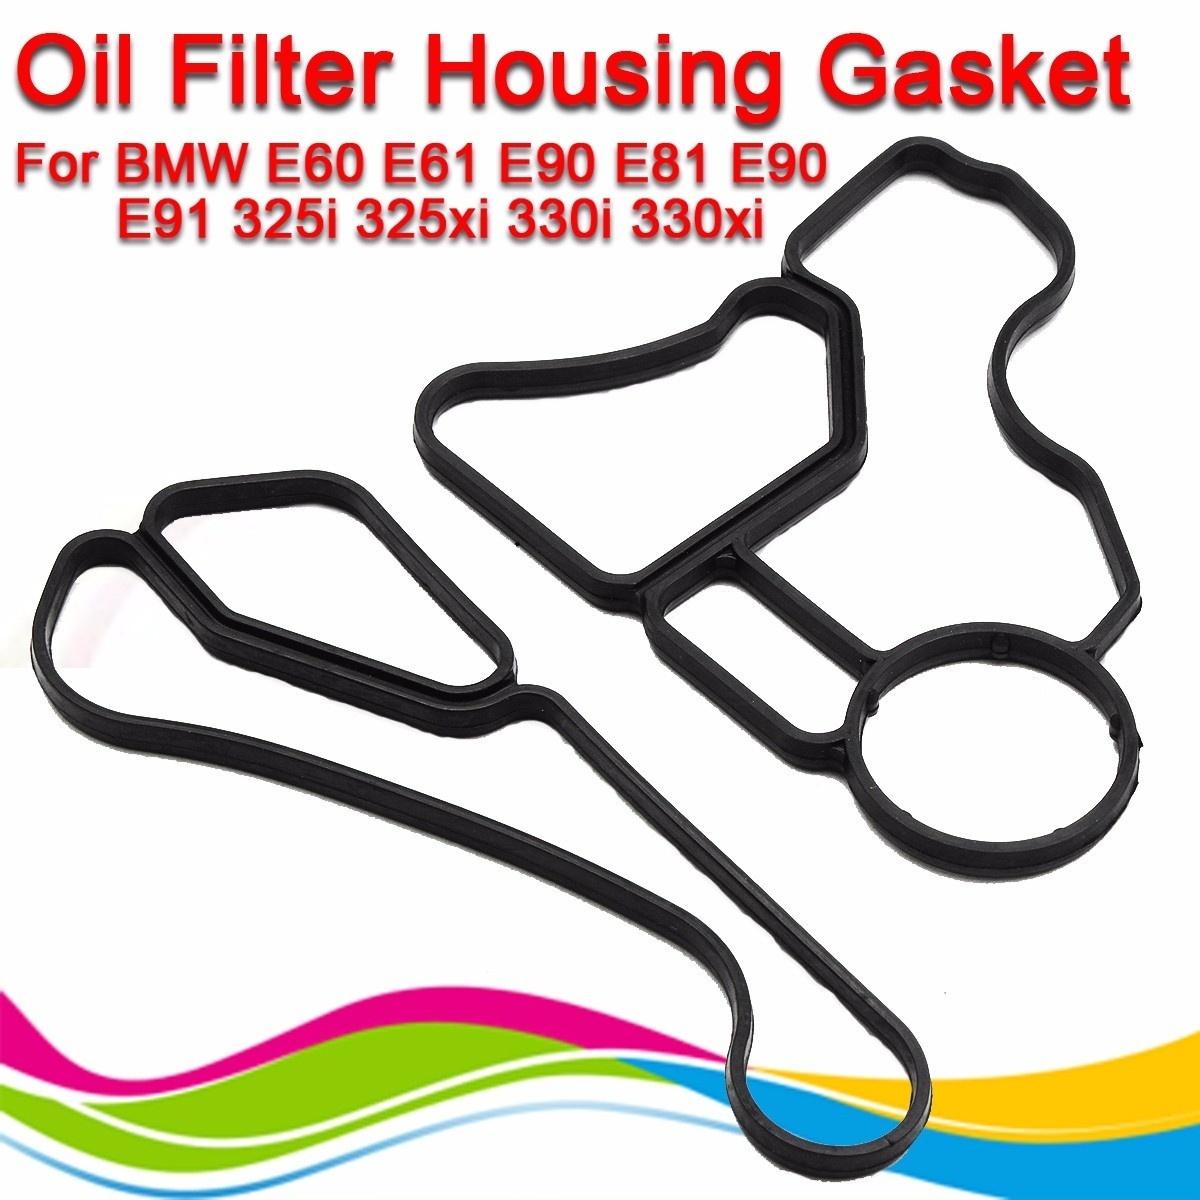 Qoo10 2pcs Oil Filter Housing Seal Gasket For E60 E61 E81 E90 E91 Bmw Fit To Viewer Prev Next